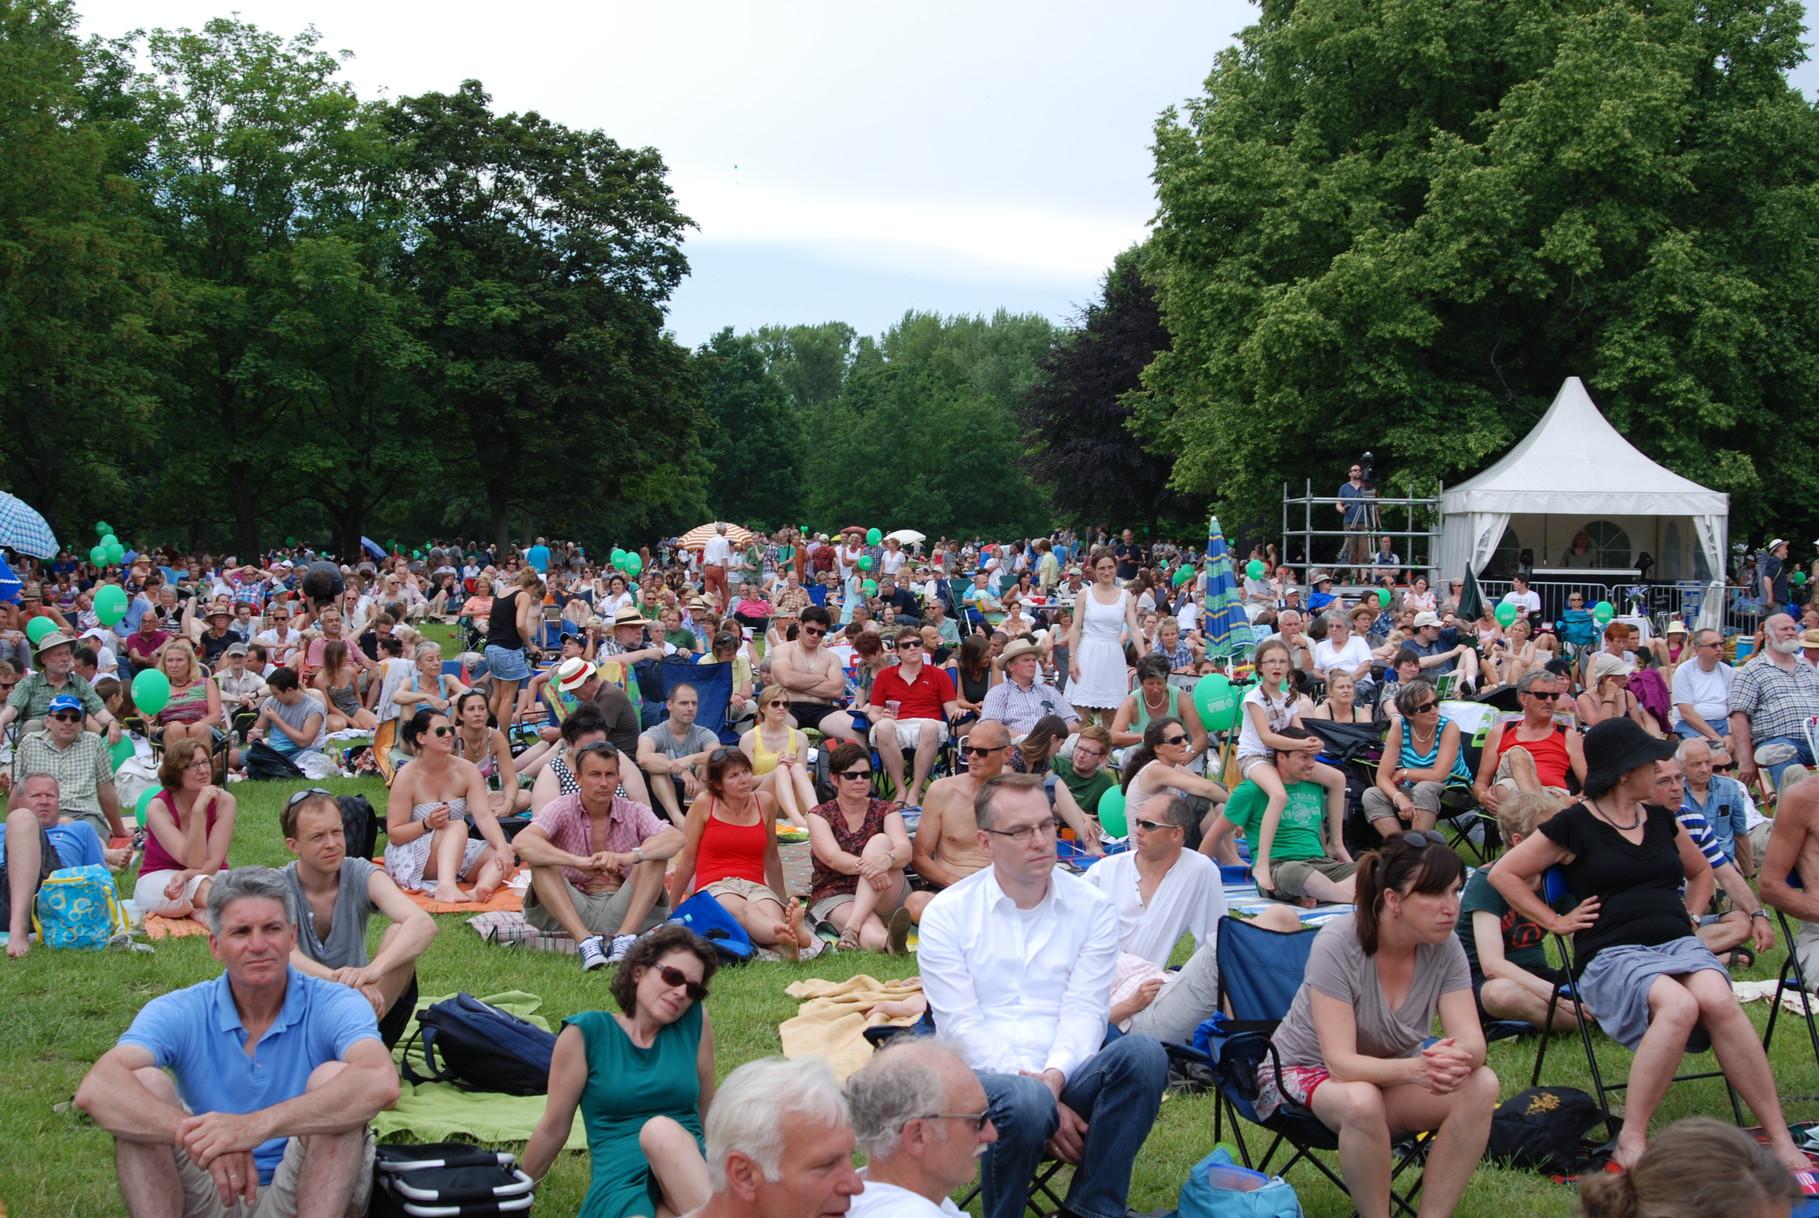 Orchester Open Air, Klassik Open Air, Klassik im Park Braunschweig